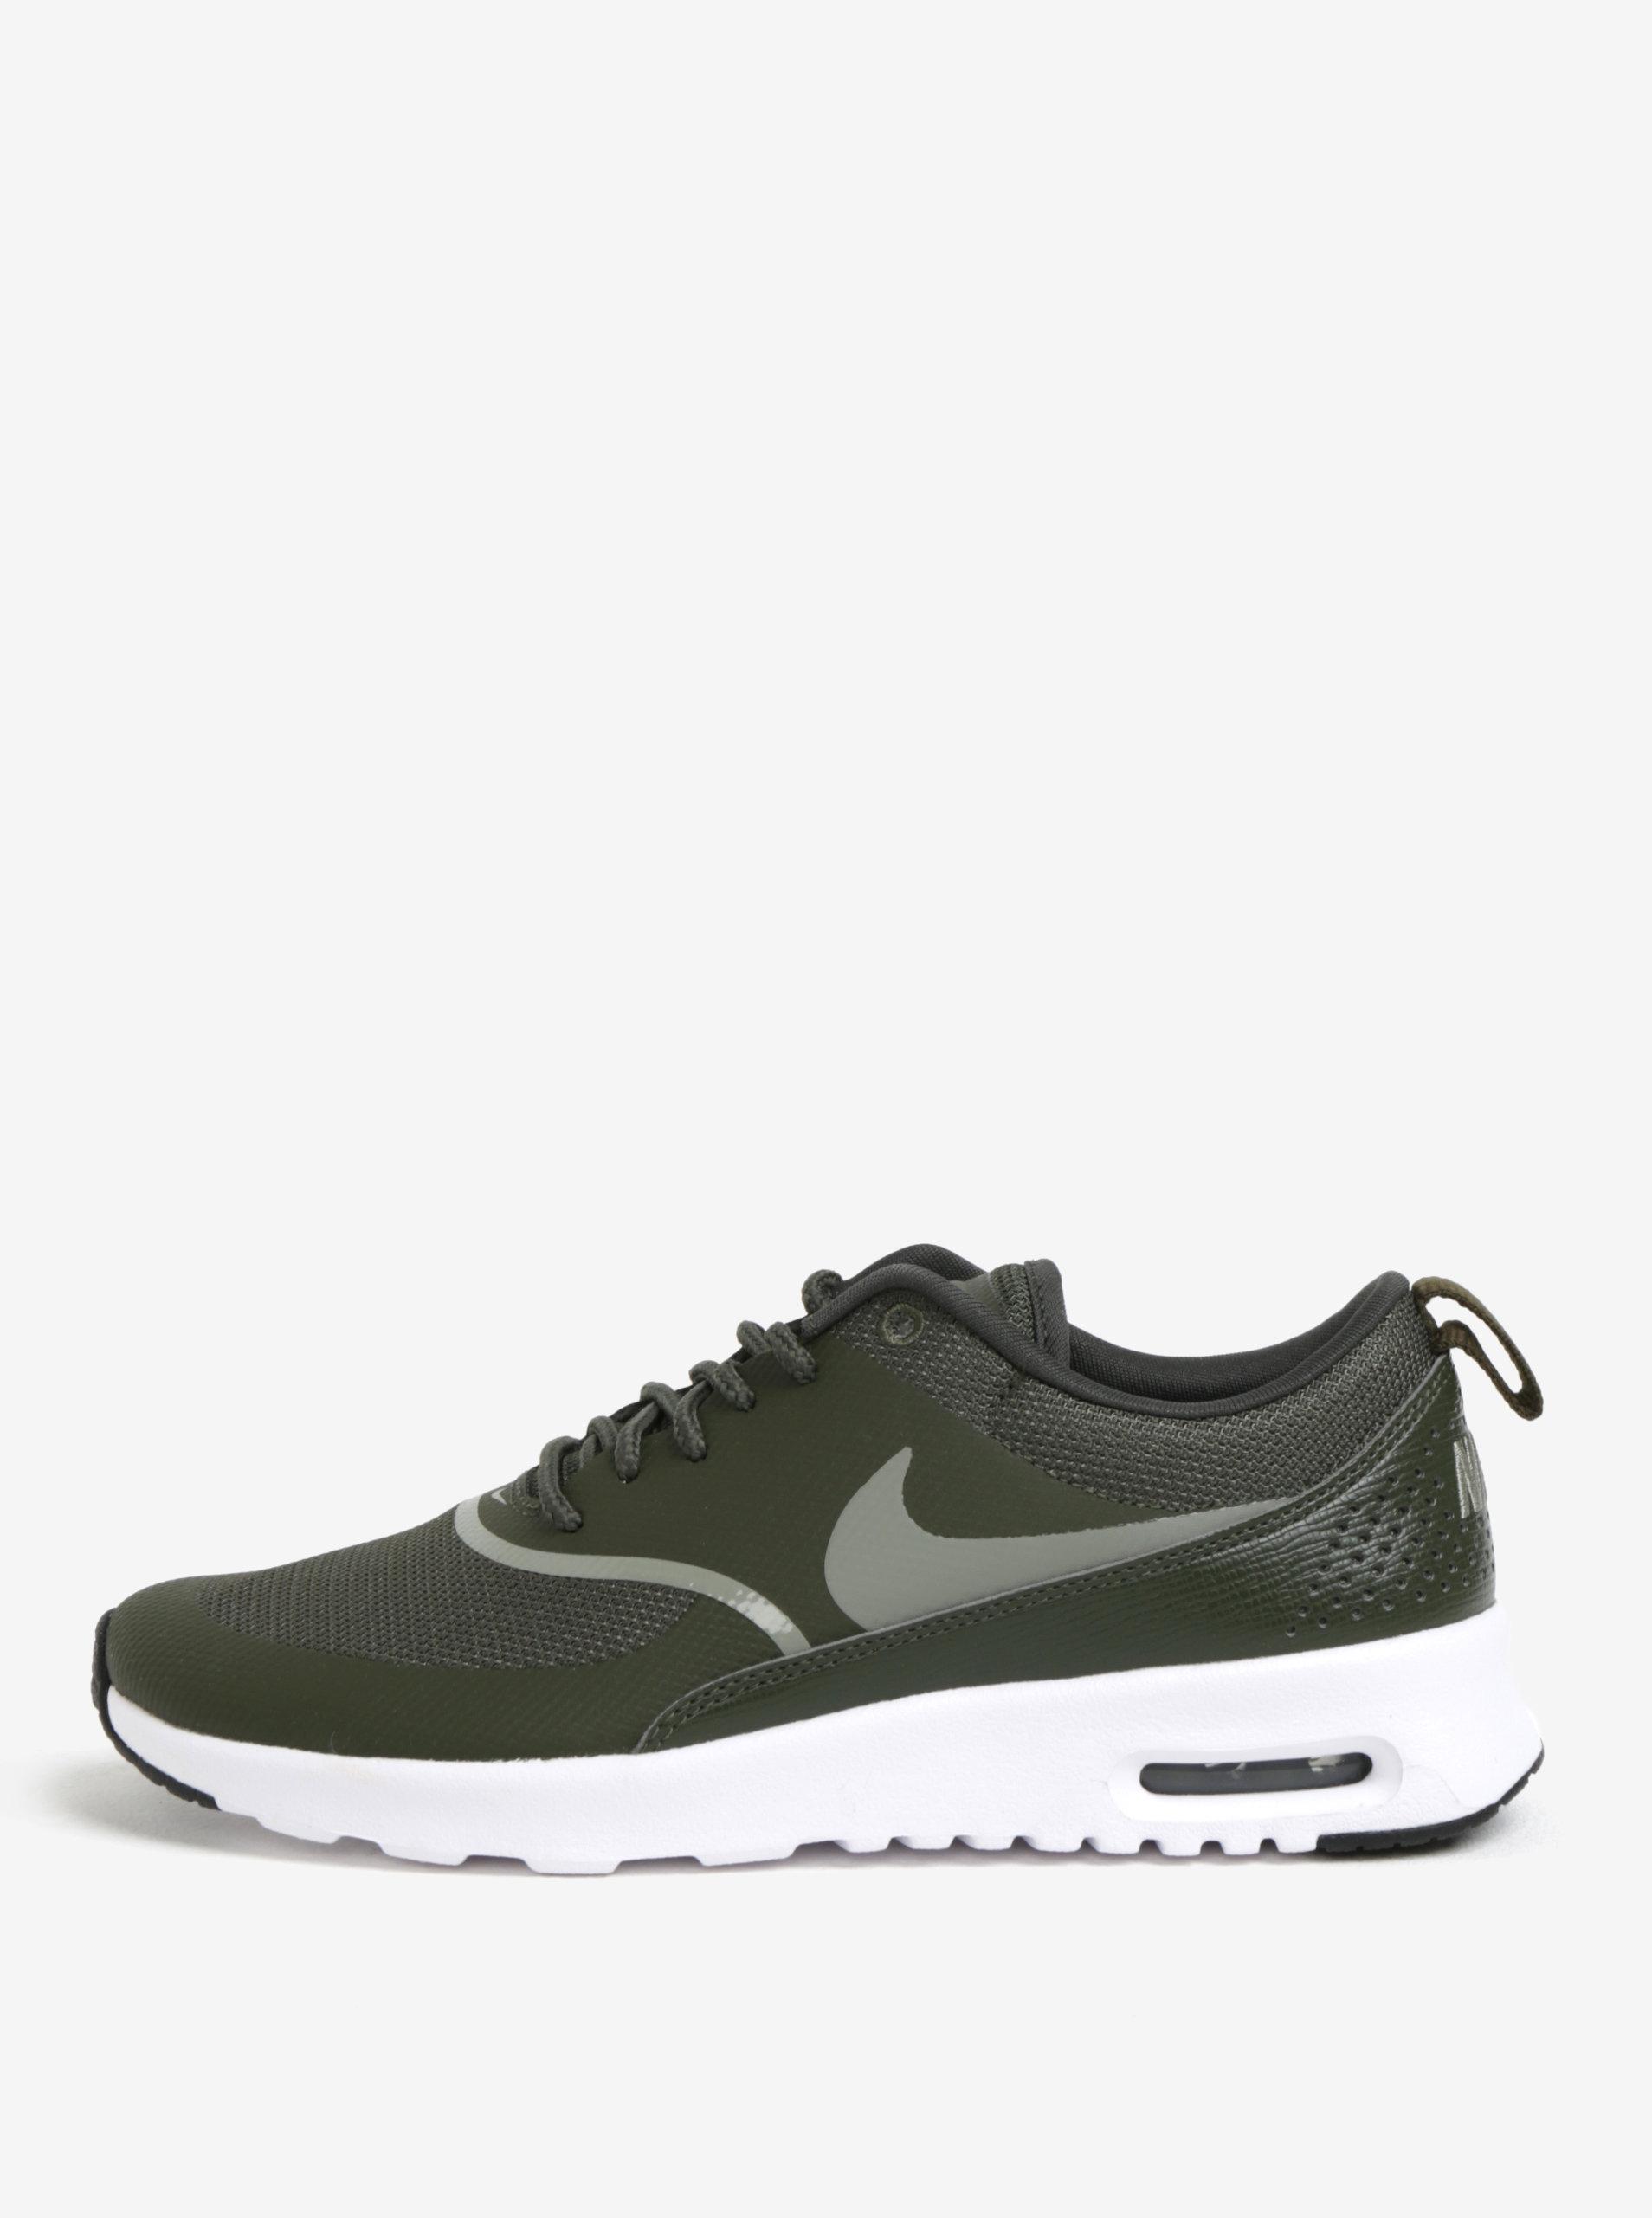 a2be2b8e077e Zelené dámske tenisky Nike Air Max Thea ...